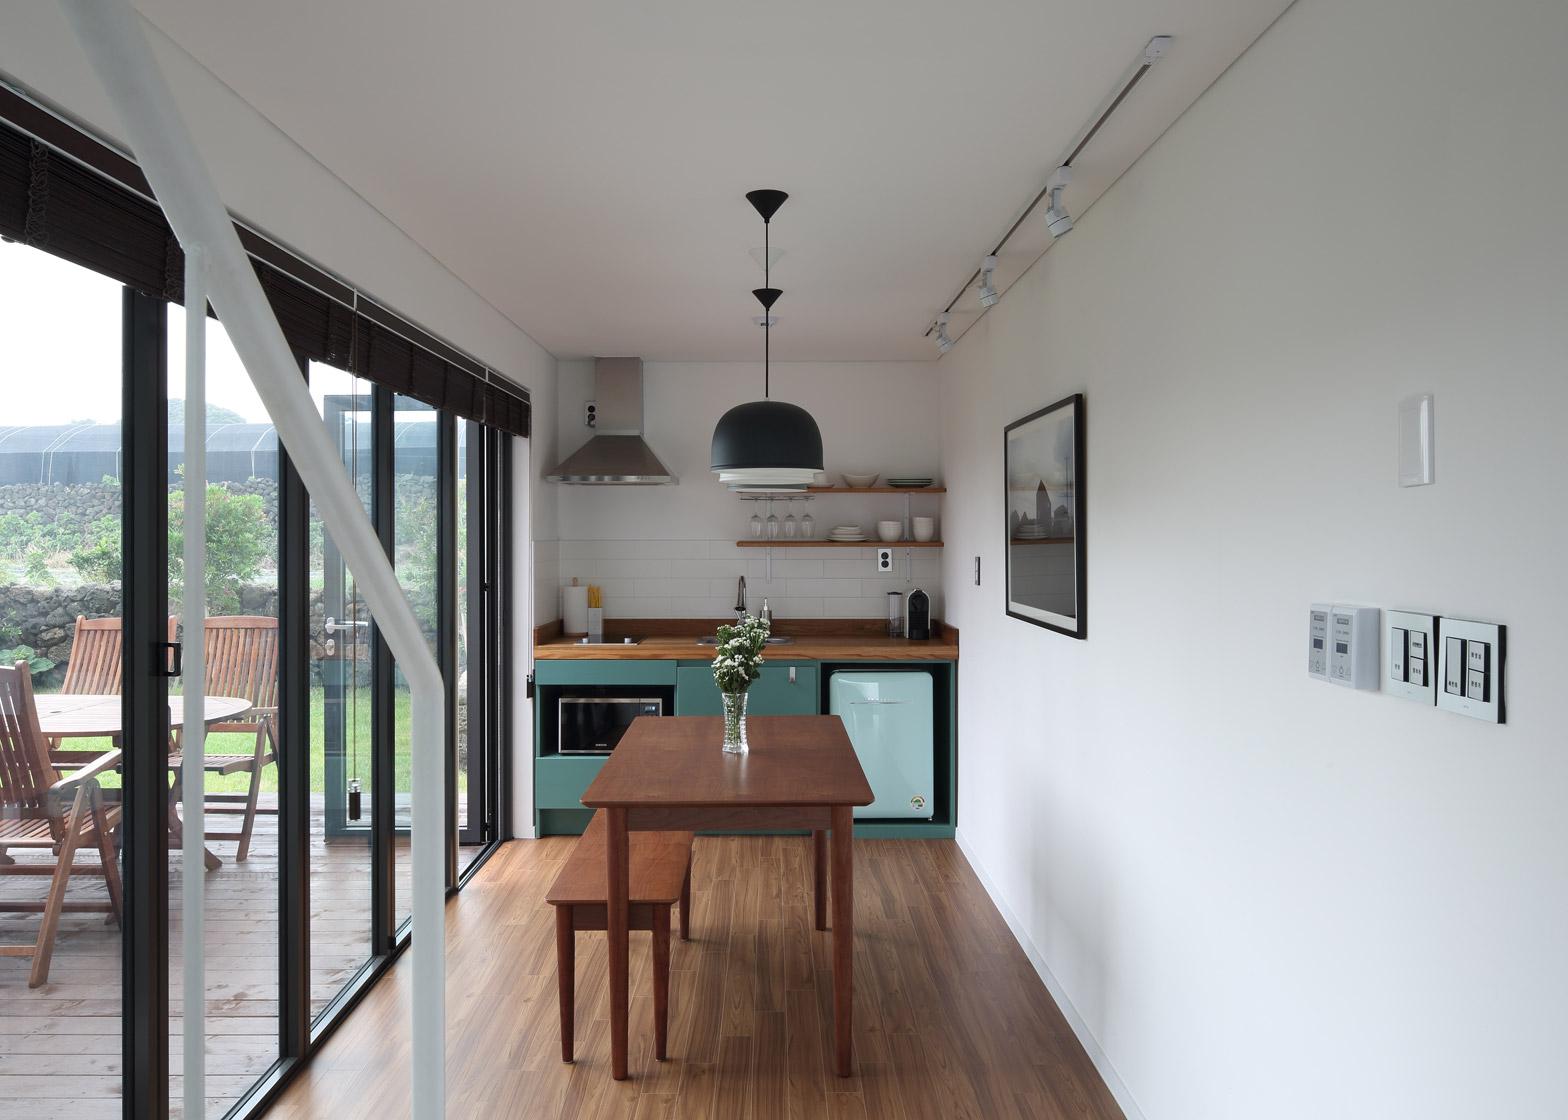 Holiday home on Jeju island in South Korea by Z Lab Studio